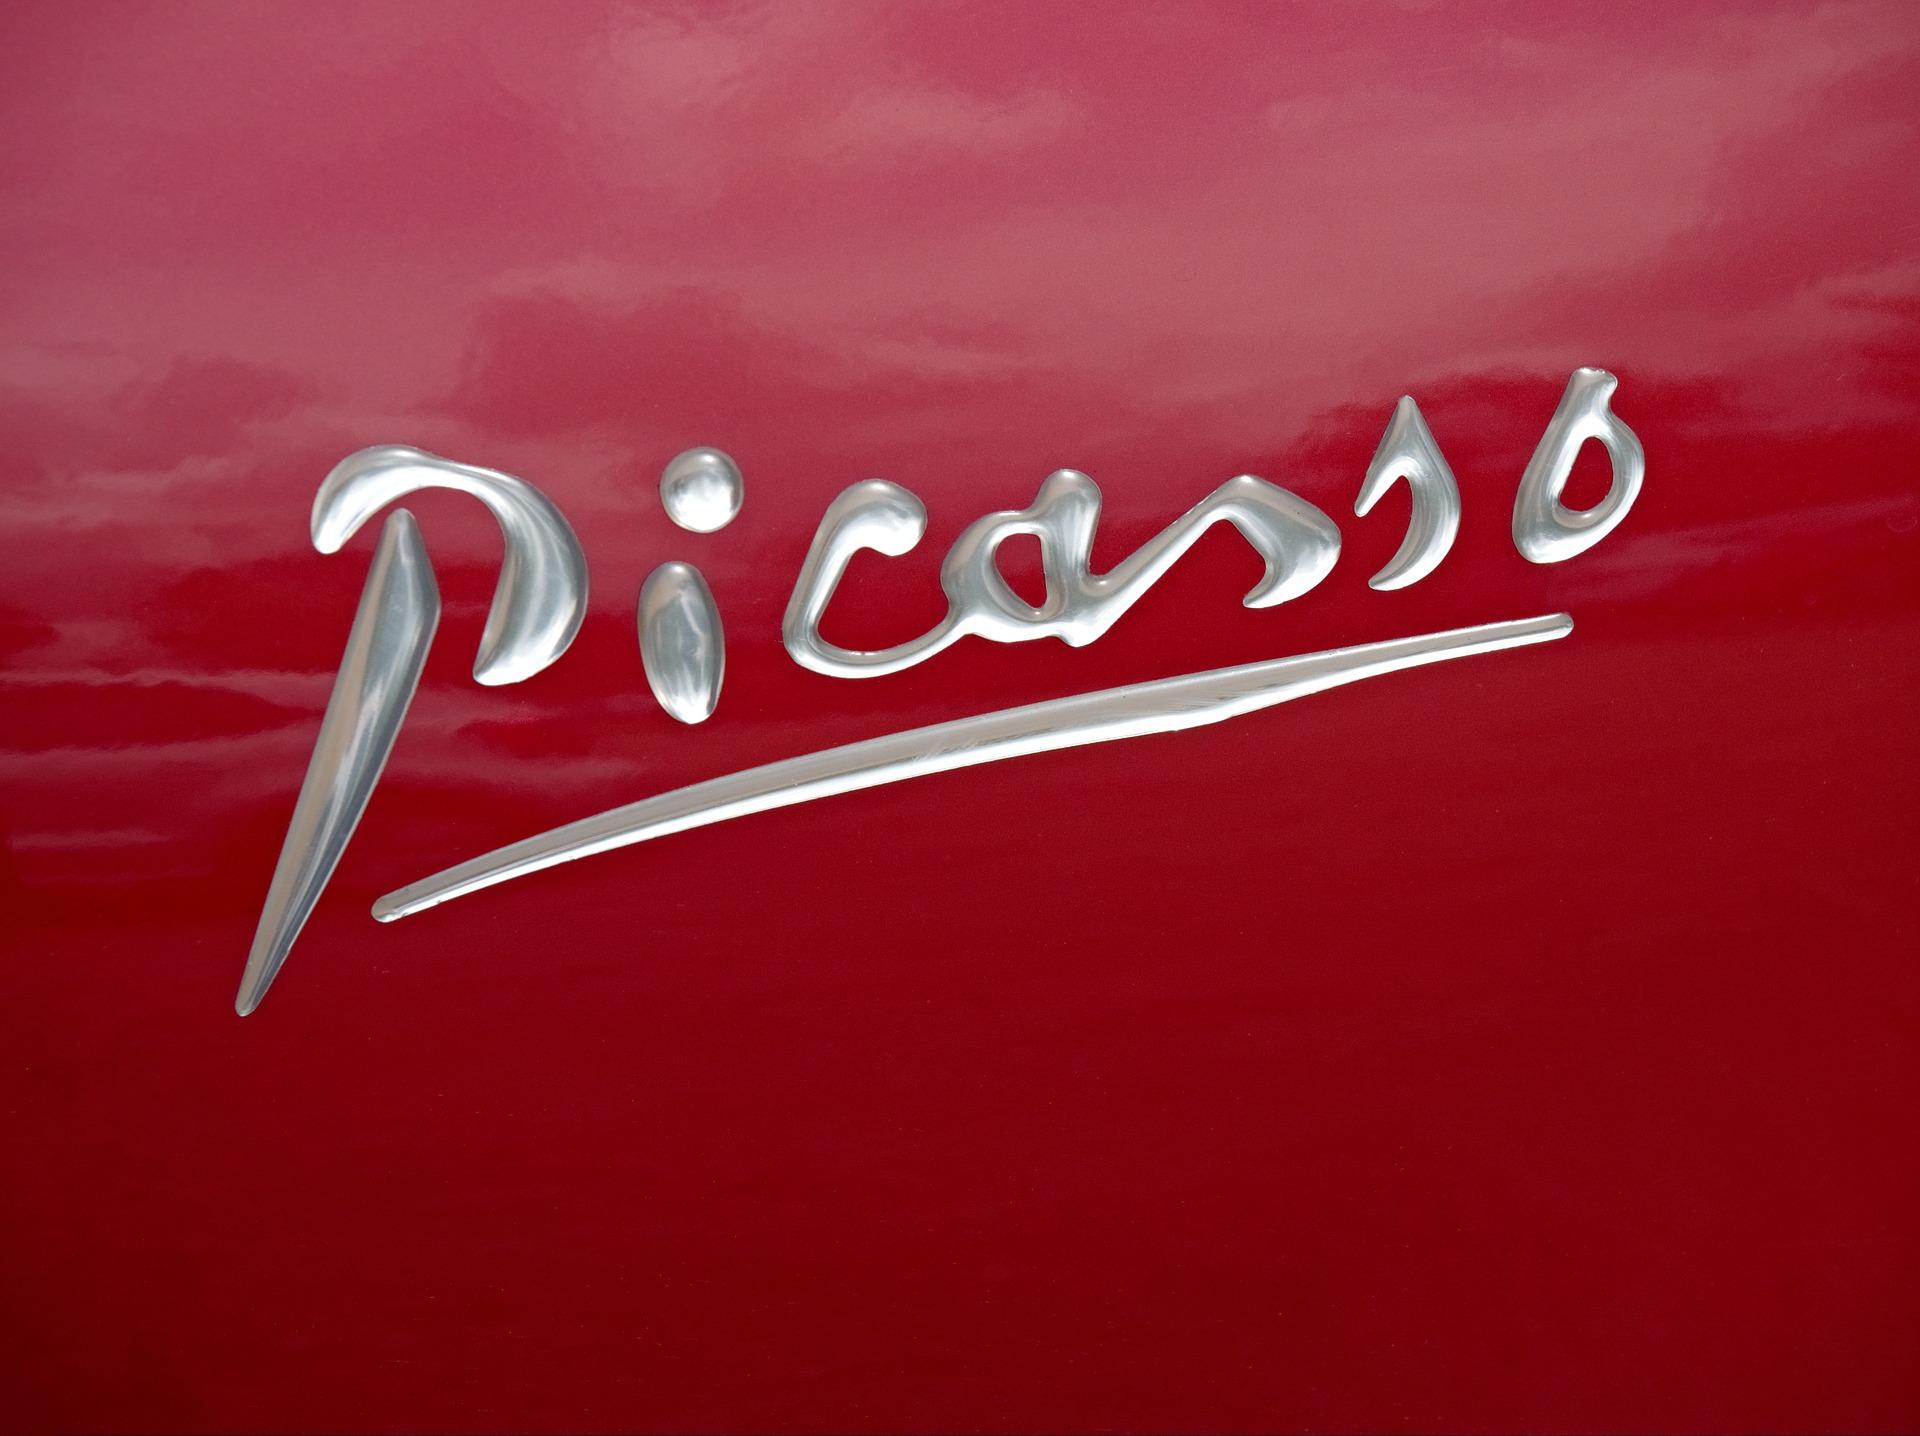 picasso-14